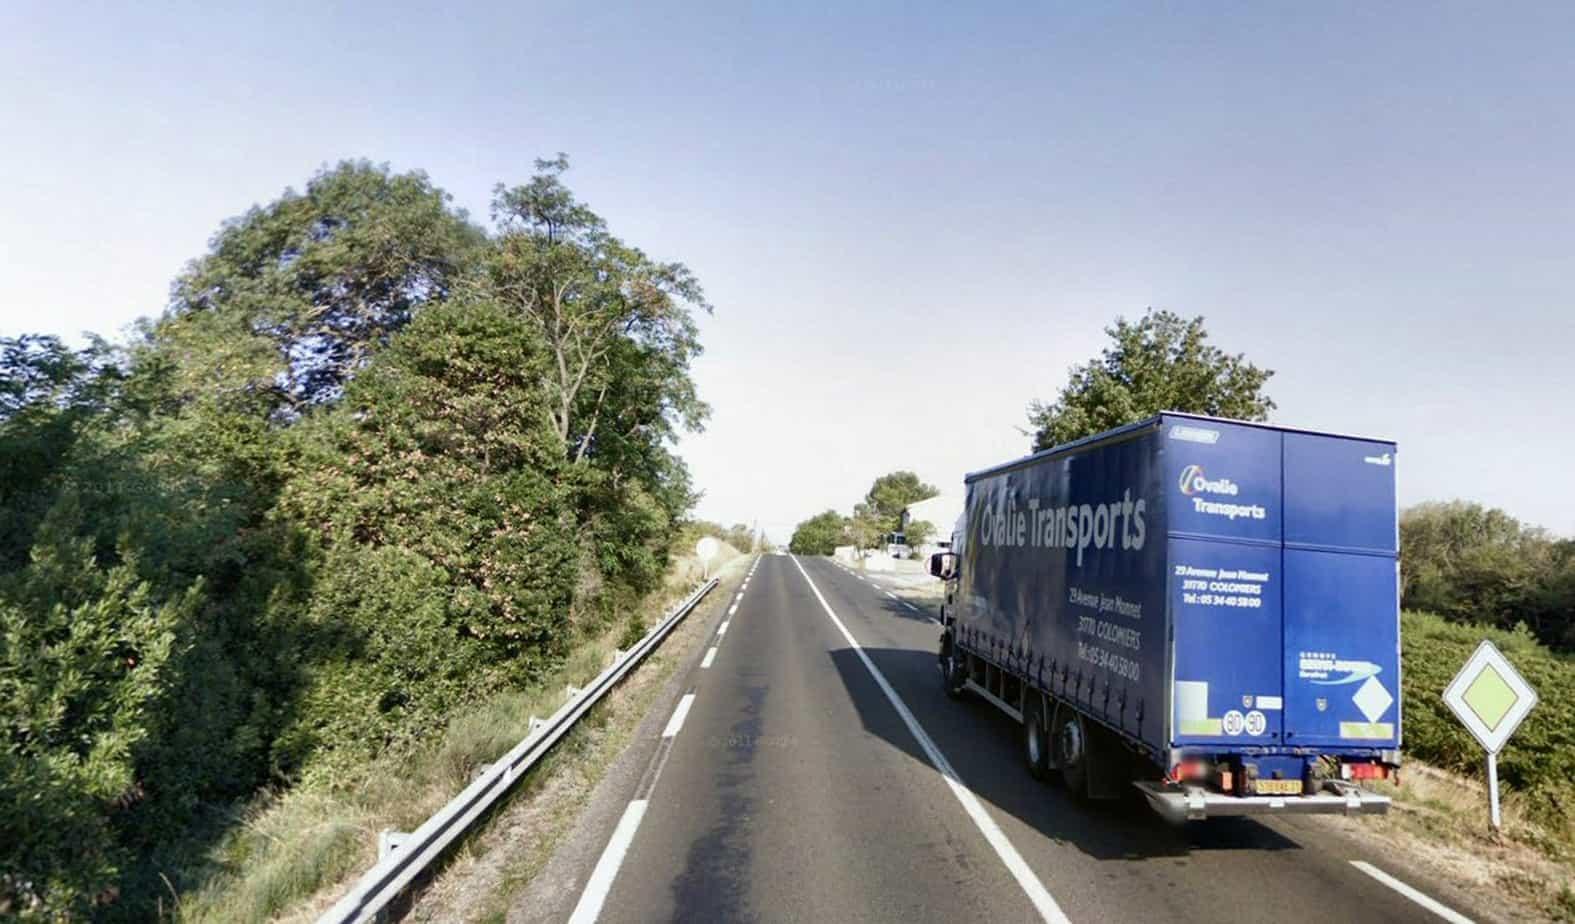 Un dosso lungo la strada dipartimentale 6113 nella località L'Horte a Trèbes (Languedoc-Roussilion)